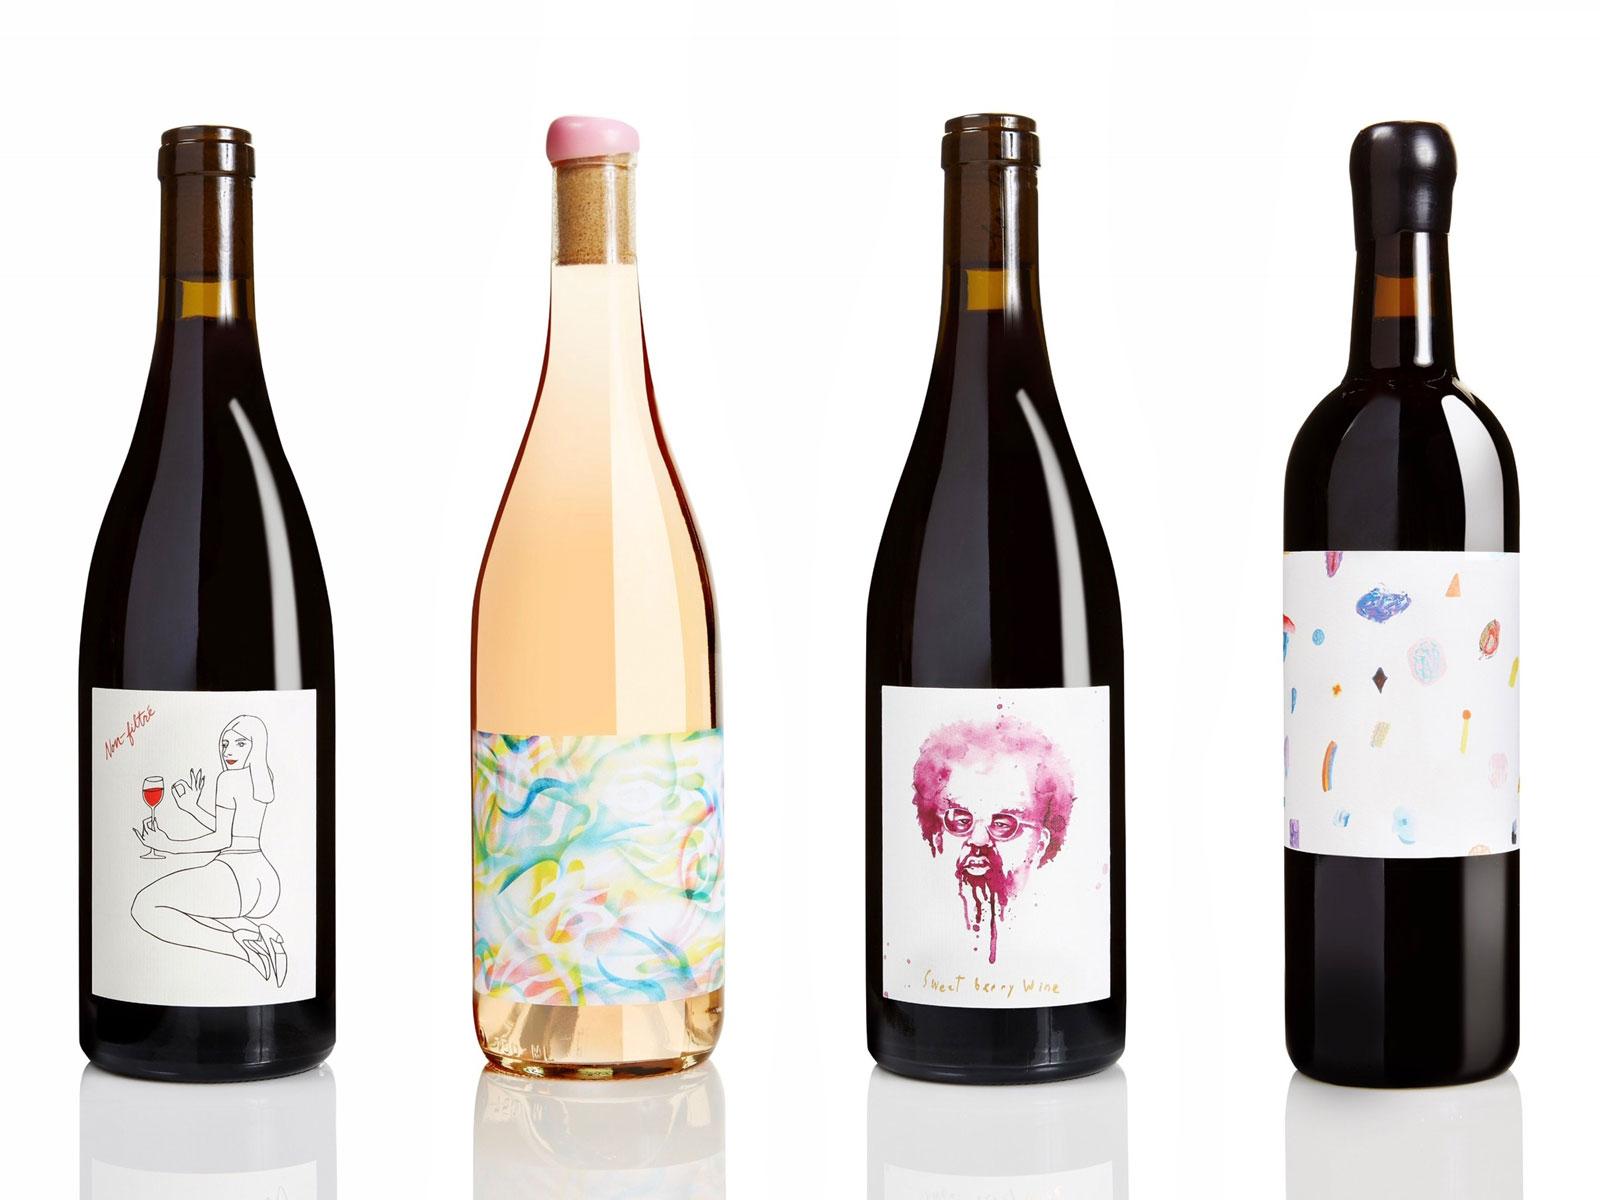 Don't Worry, Eric Wareheim Is Making More of His Cult-Favorite Wine eric-wareheim-las-jaras-2-FT-BLOG0818